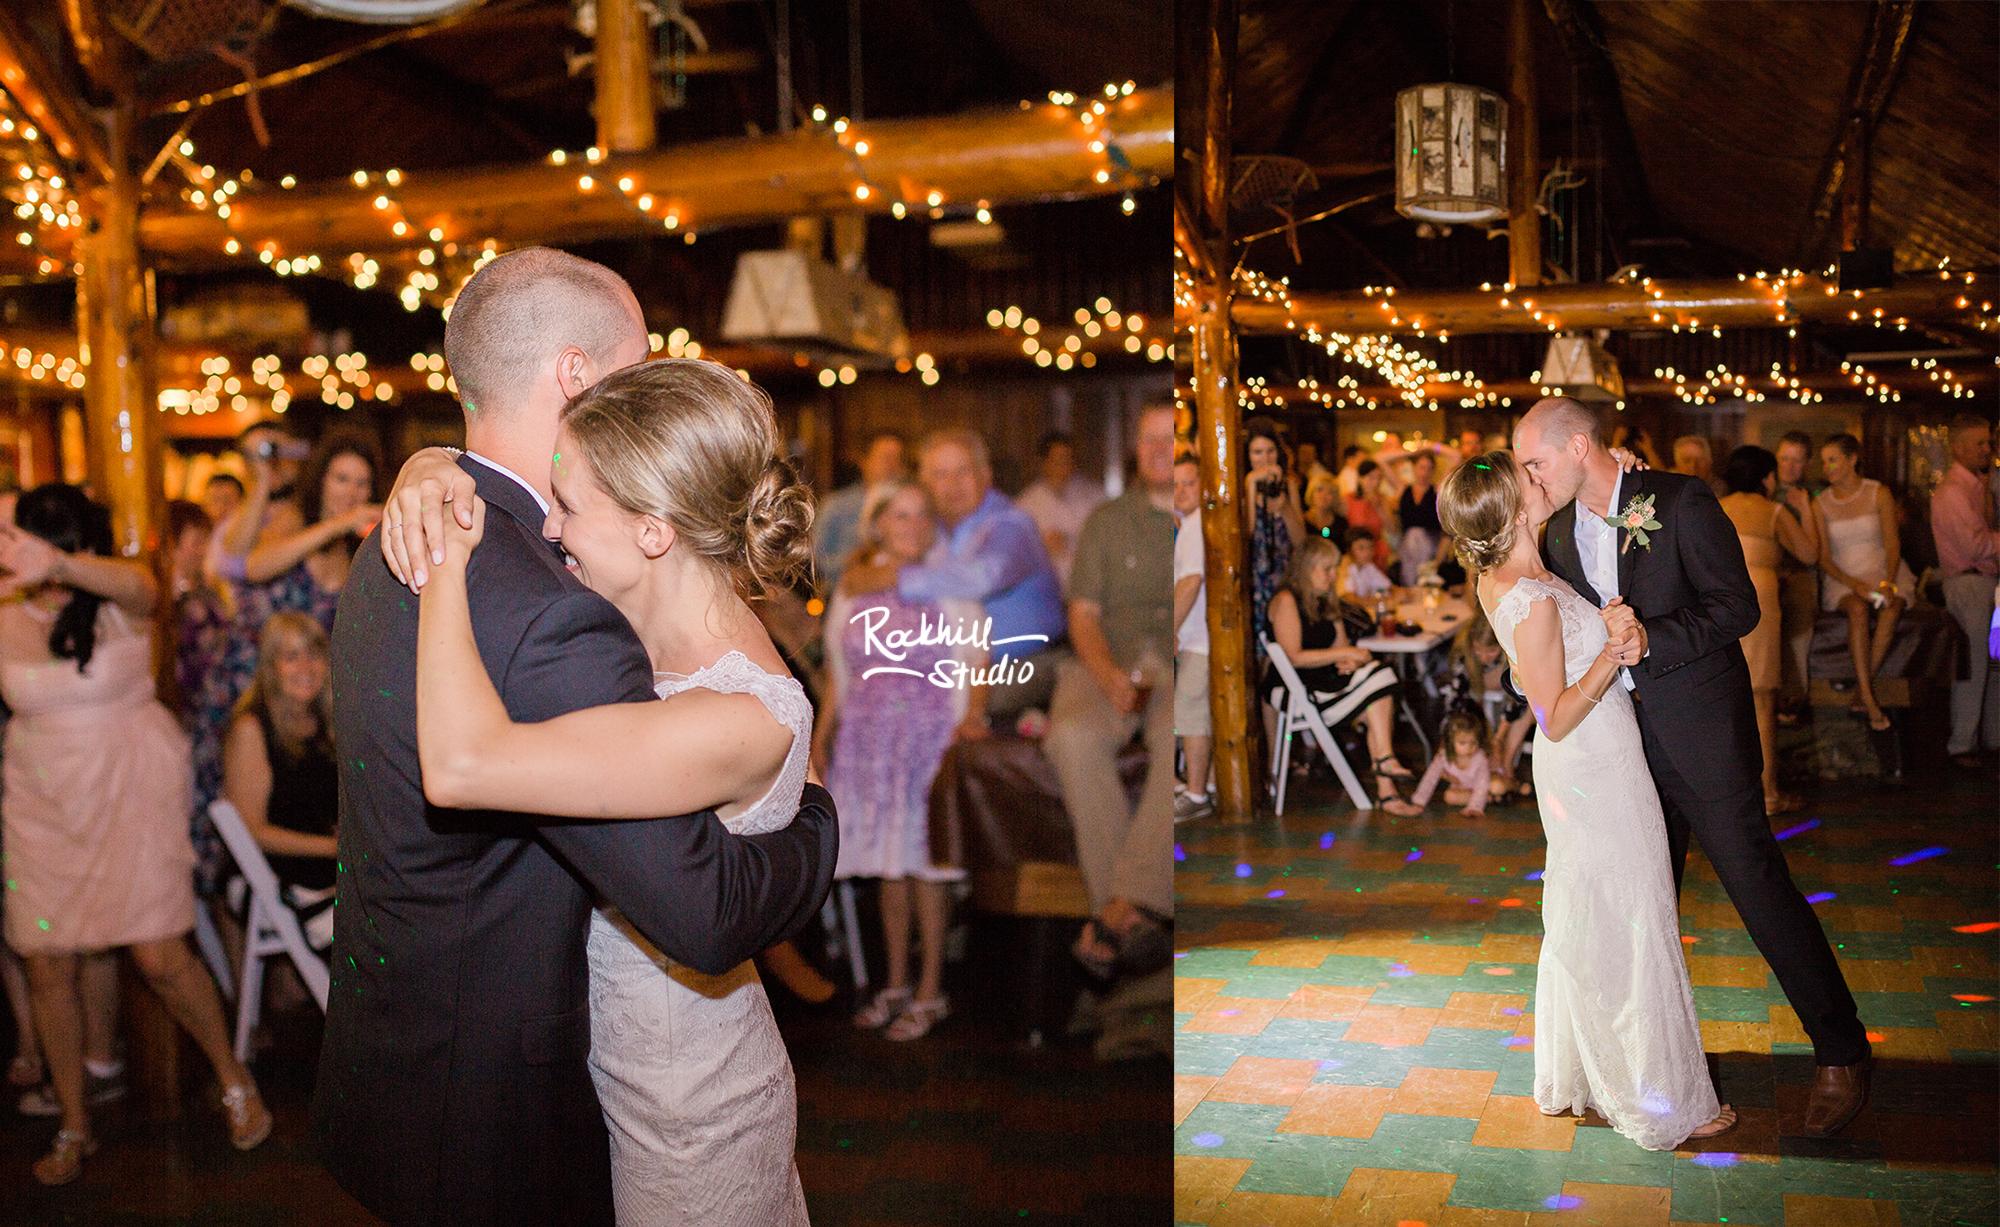 grand-marais-wedding-photography-upper-peninsula-northern-michigan-rockhill-100.jpg